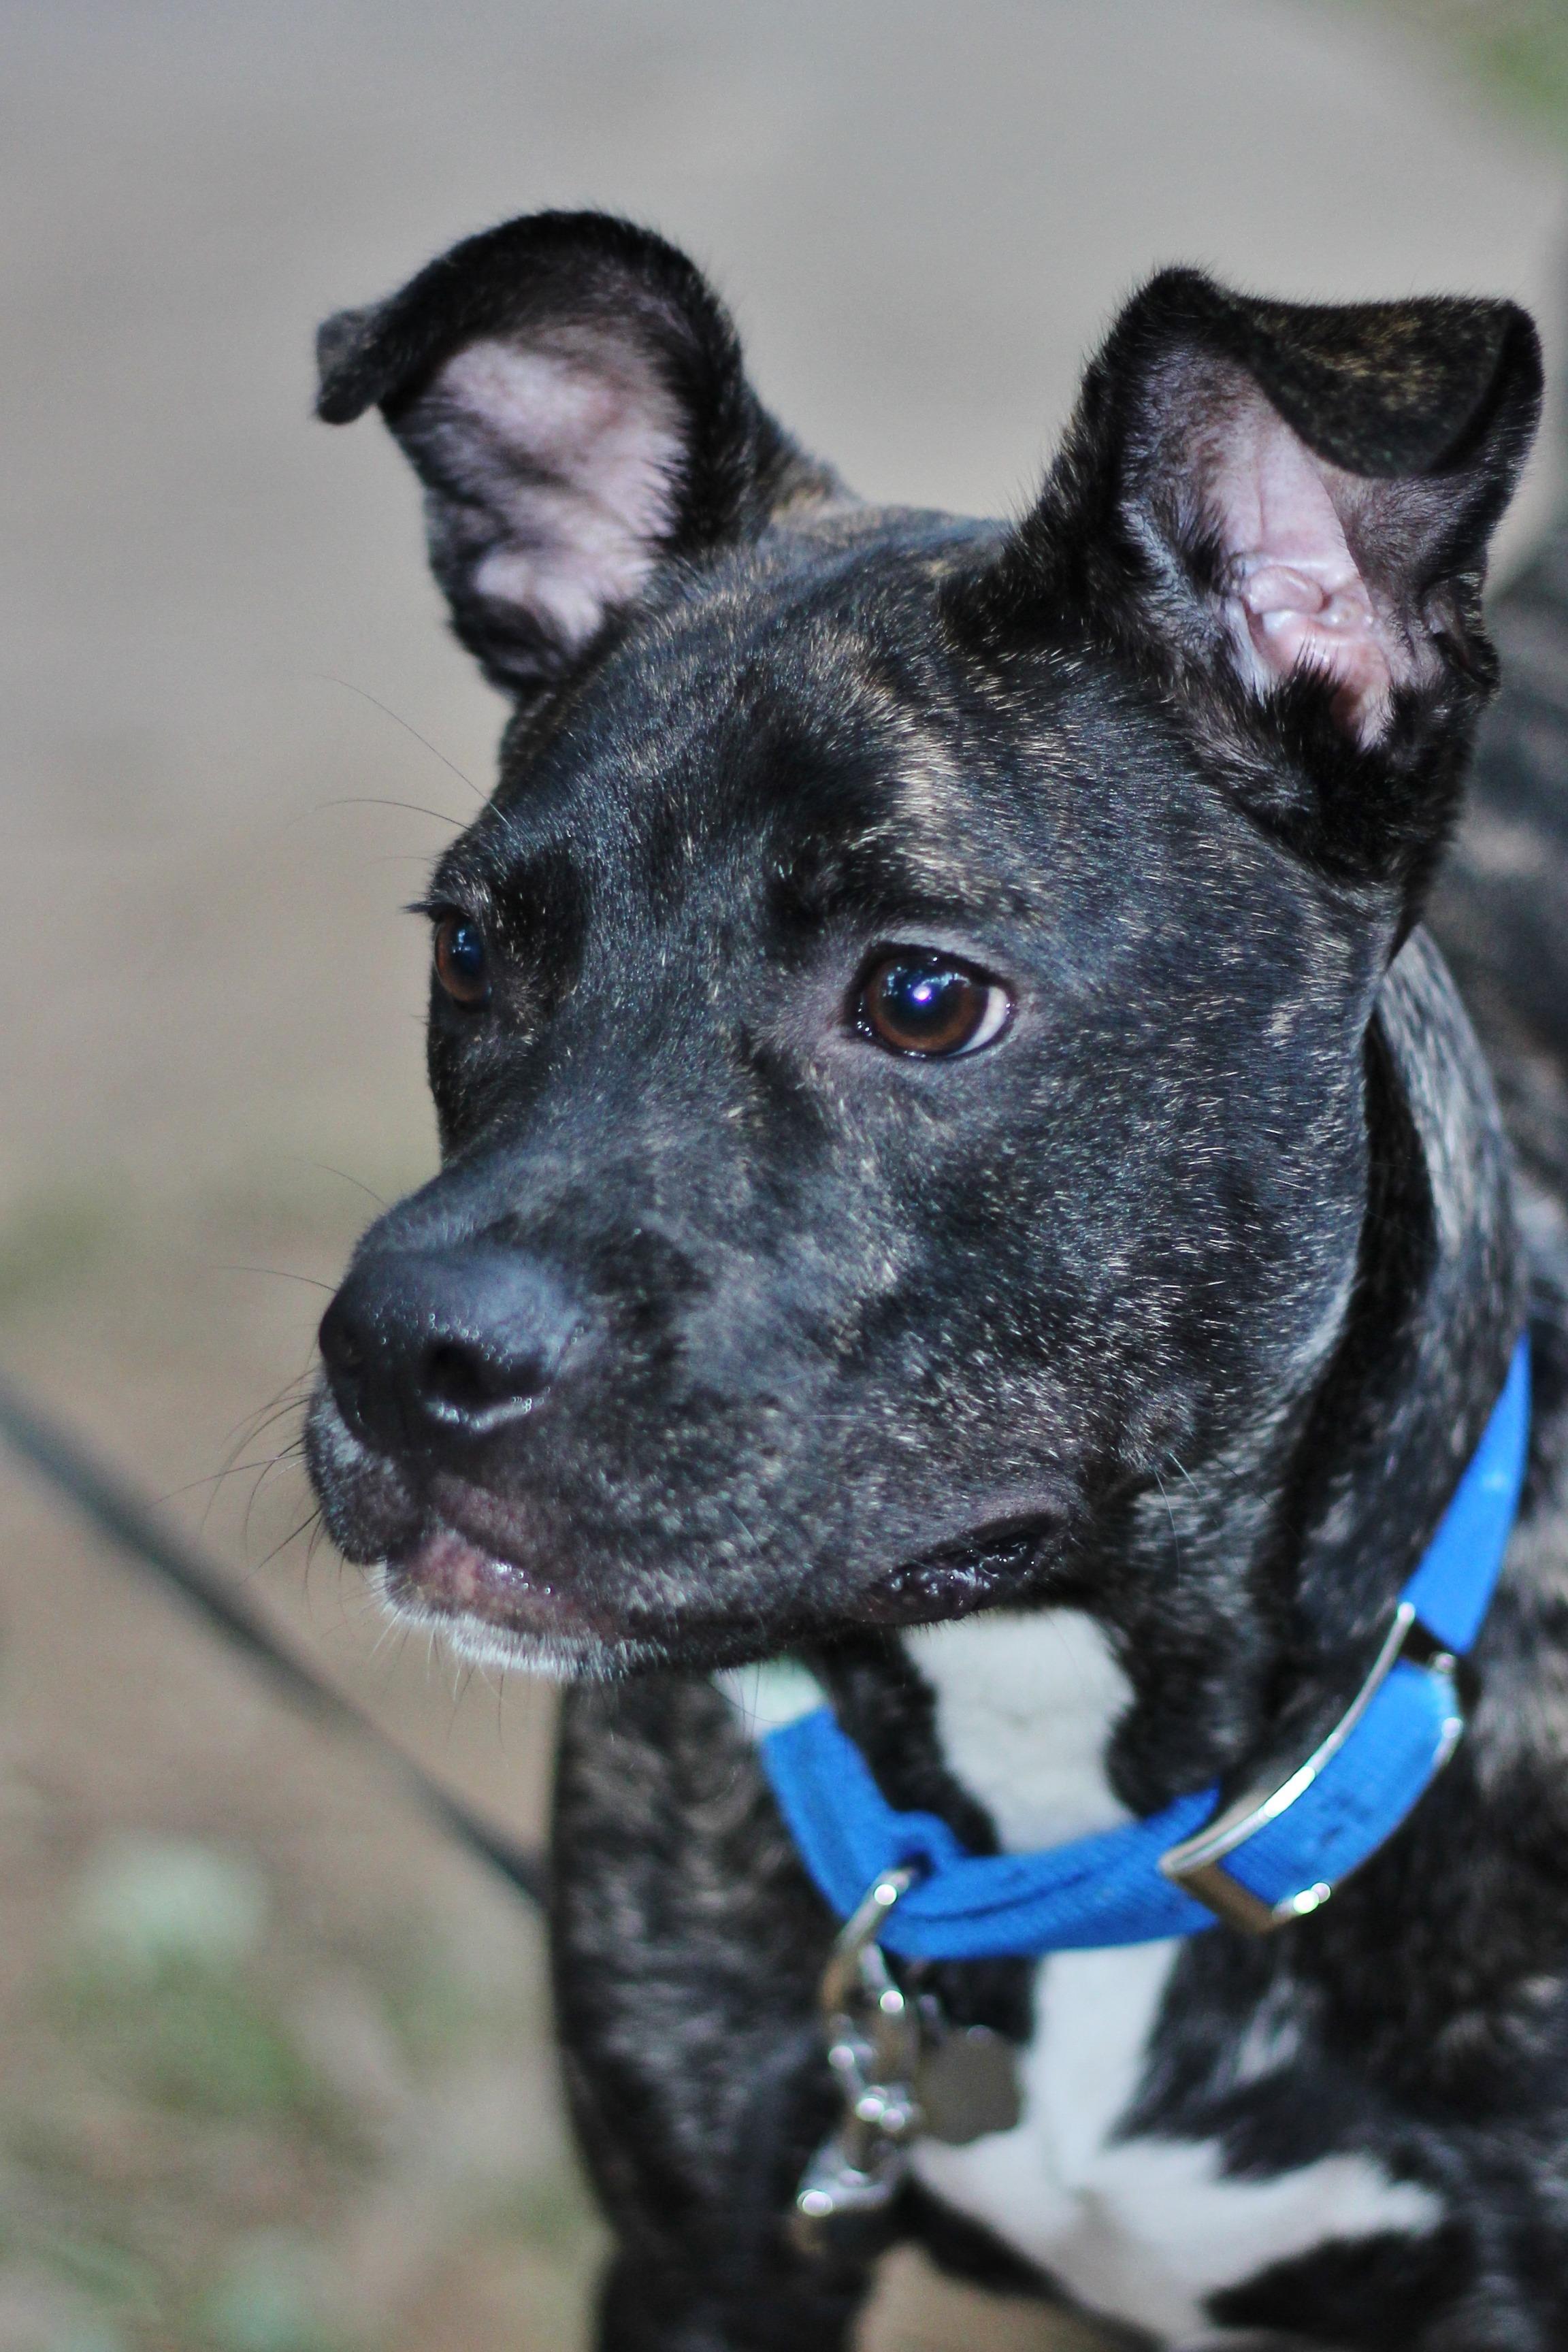 Wonderful Puppy Black Adorable Dog - puppy-dog-animal-canine-pet-fur-young-mammal-black-outdoors-vertebrate-domestic-adorable-dog-breed-terrier-dog-like-mammal-carnivoran-american-pit-bull-terrier-983262  Trends_608448  .jpg